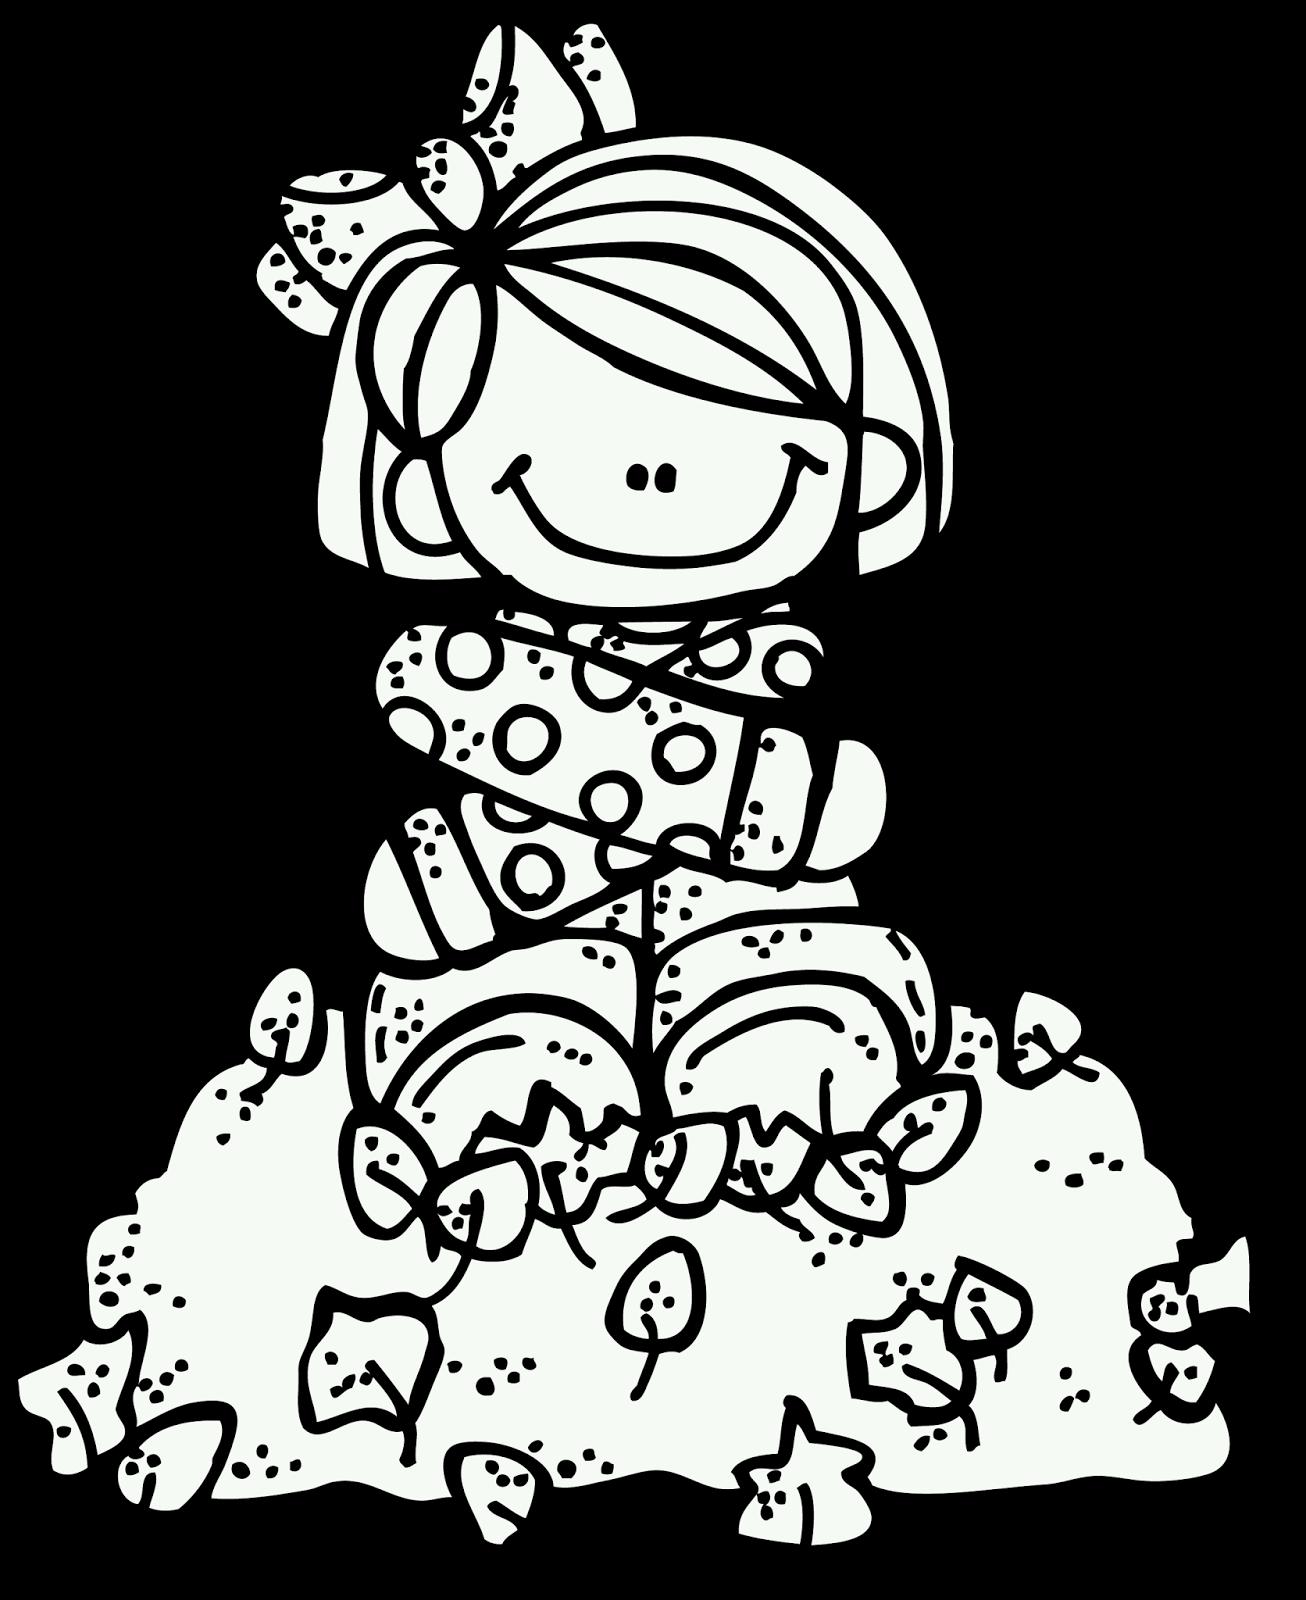 Clipart fall melonheadz. Happy my friends